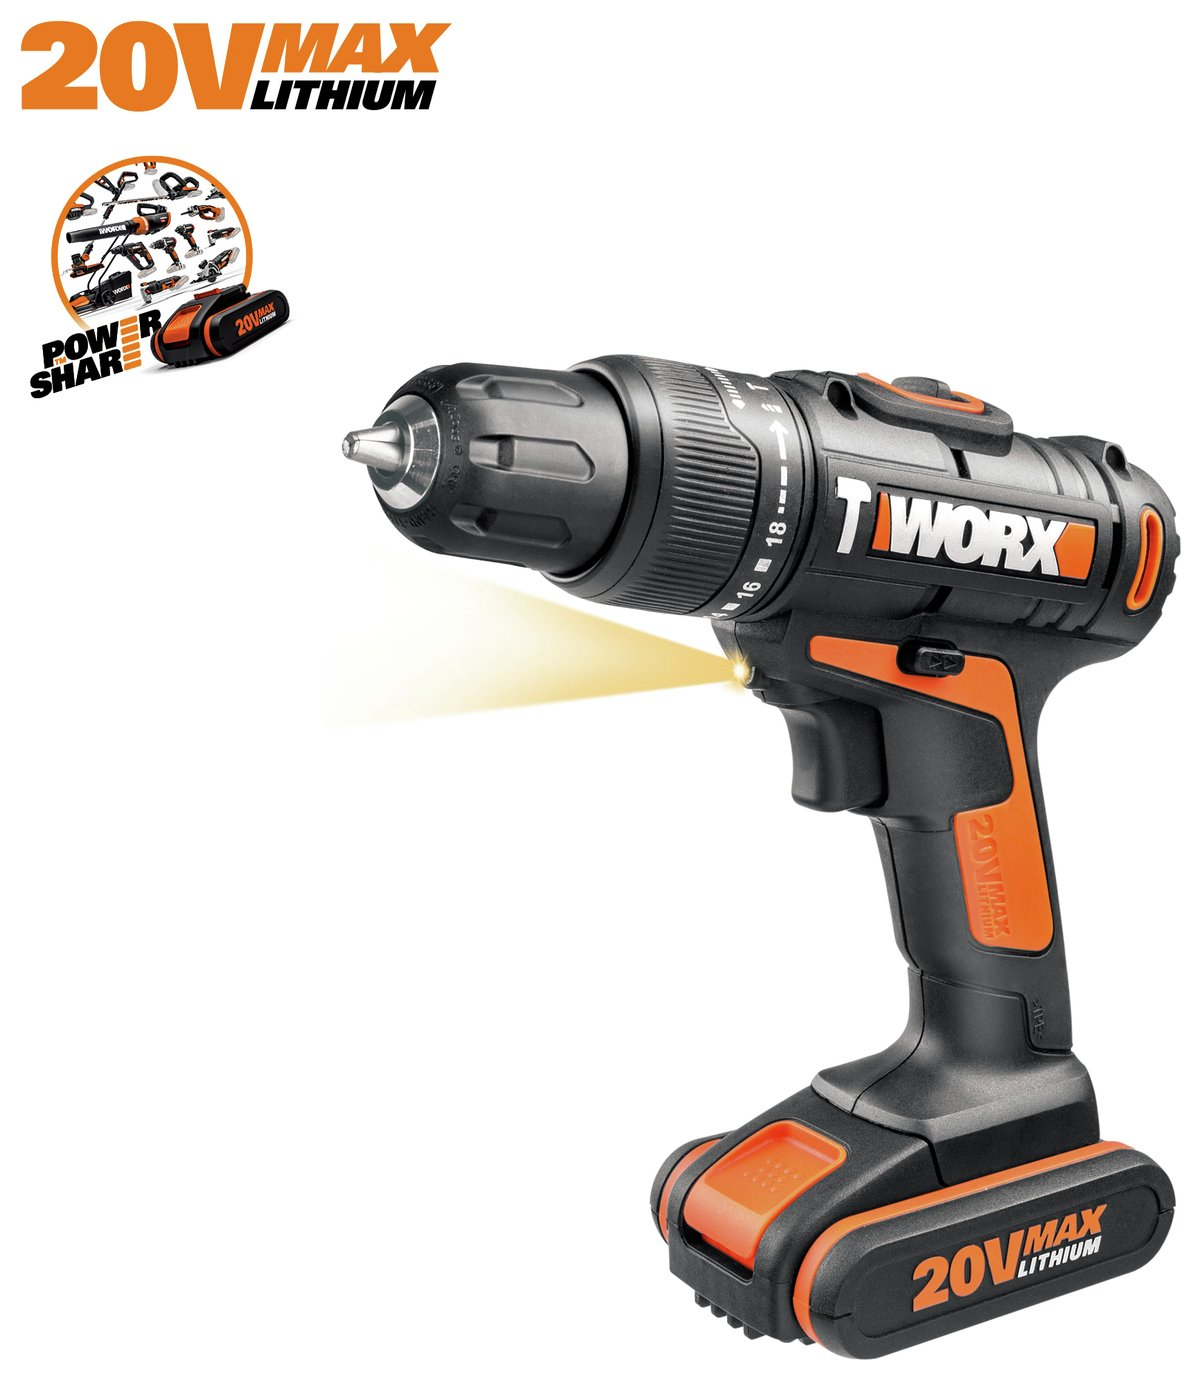 WORX WX366.2 1.5Ah Cordless Hammer Drill - 20V